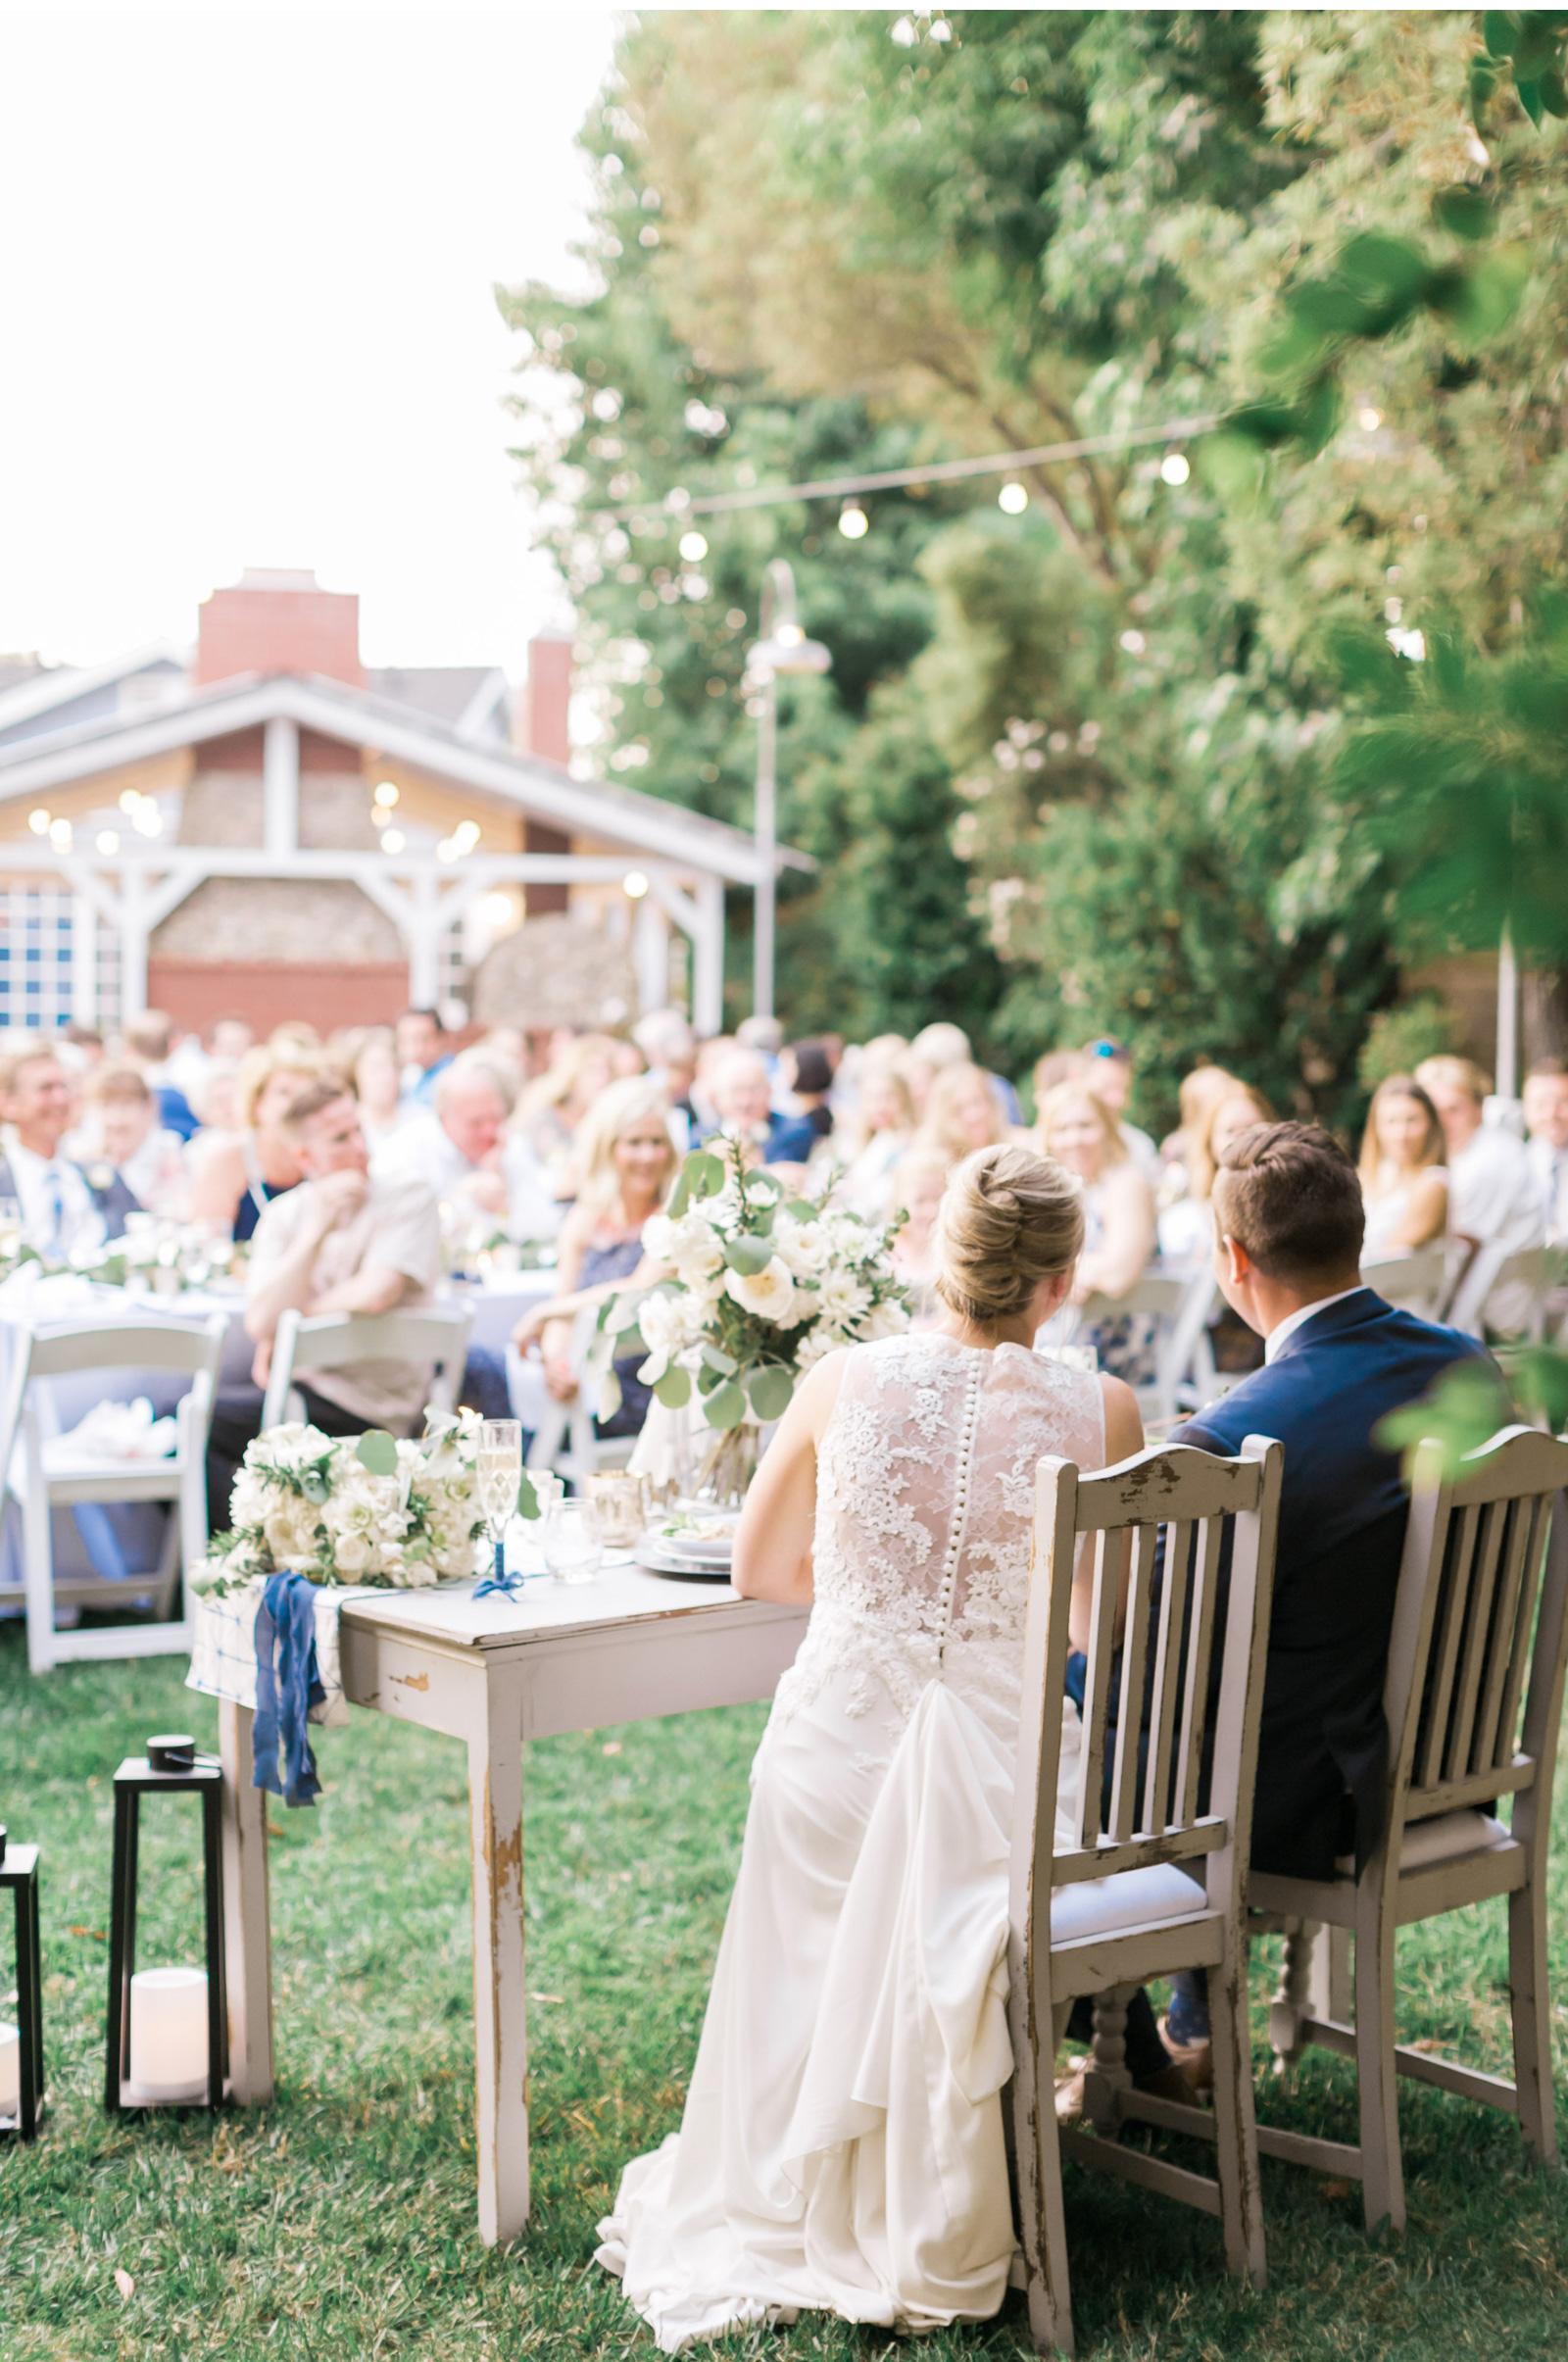 Malibu-Wedding-Photographer-Natalie-Schutt-Photography-Fine-Art-Film-Photography_06.jpg